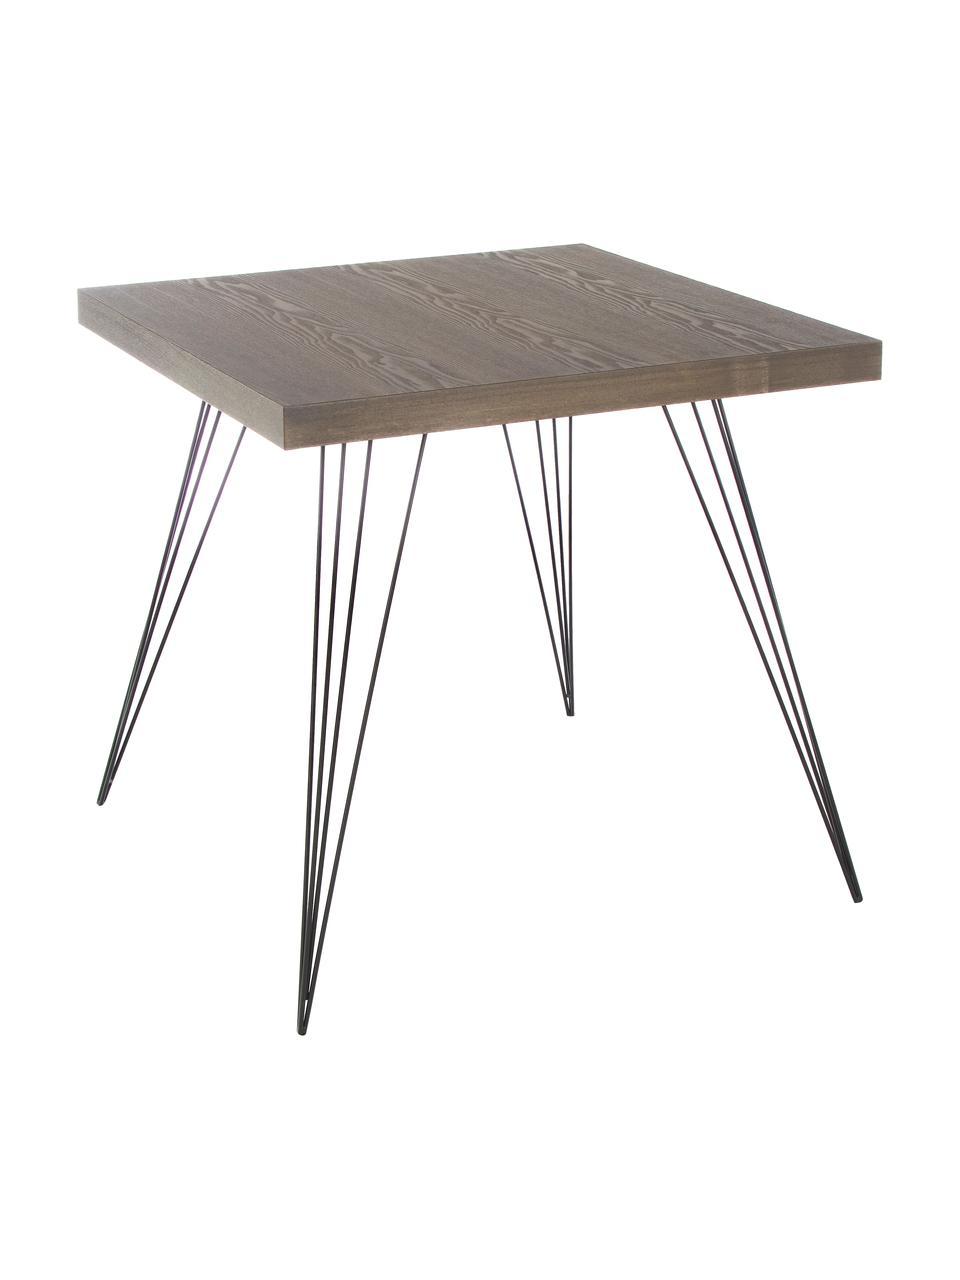 petite table carree a pieds en metal wolcott